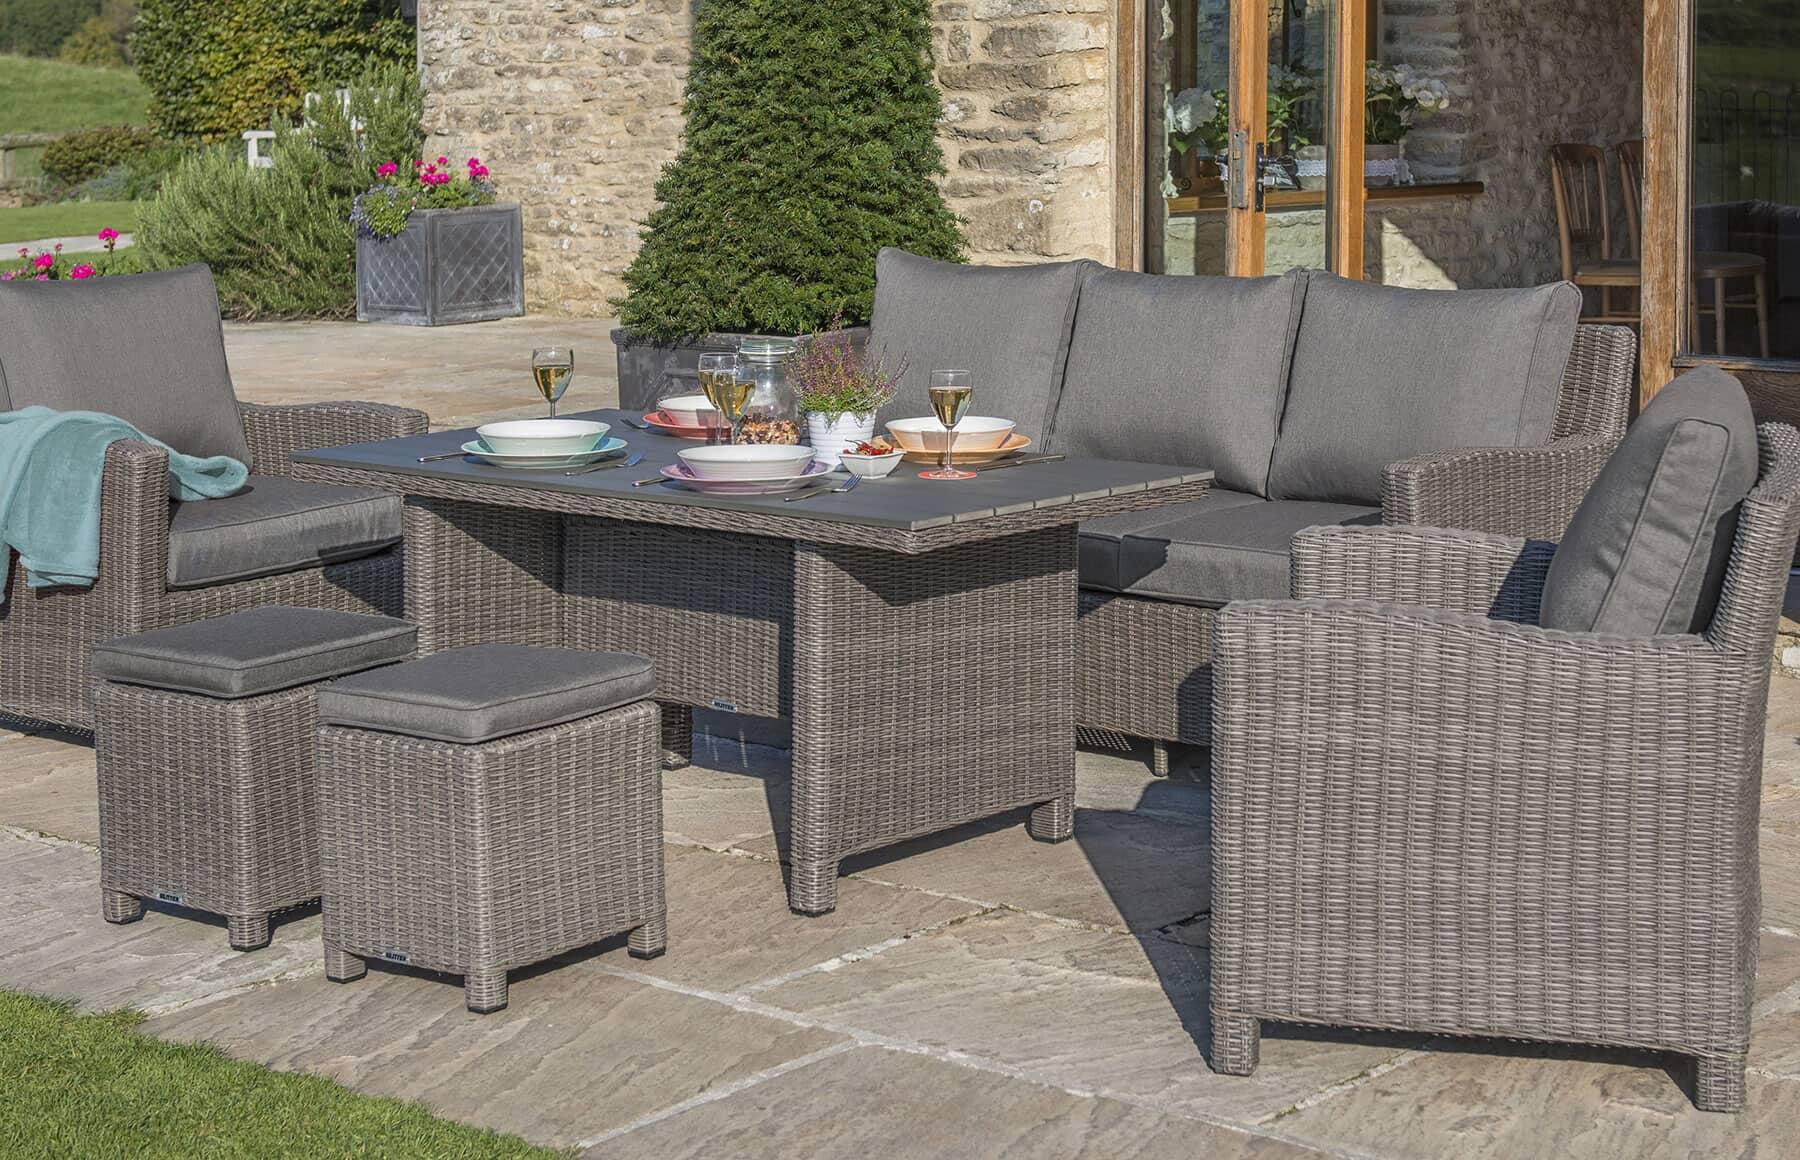 kettler palma casual dining set rattan kpalcas01 garden furniture world. Black Bedroom Furniture Sets. Home Design Ideas